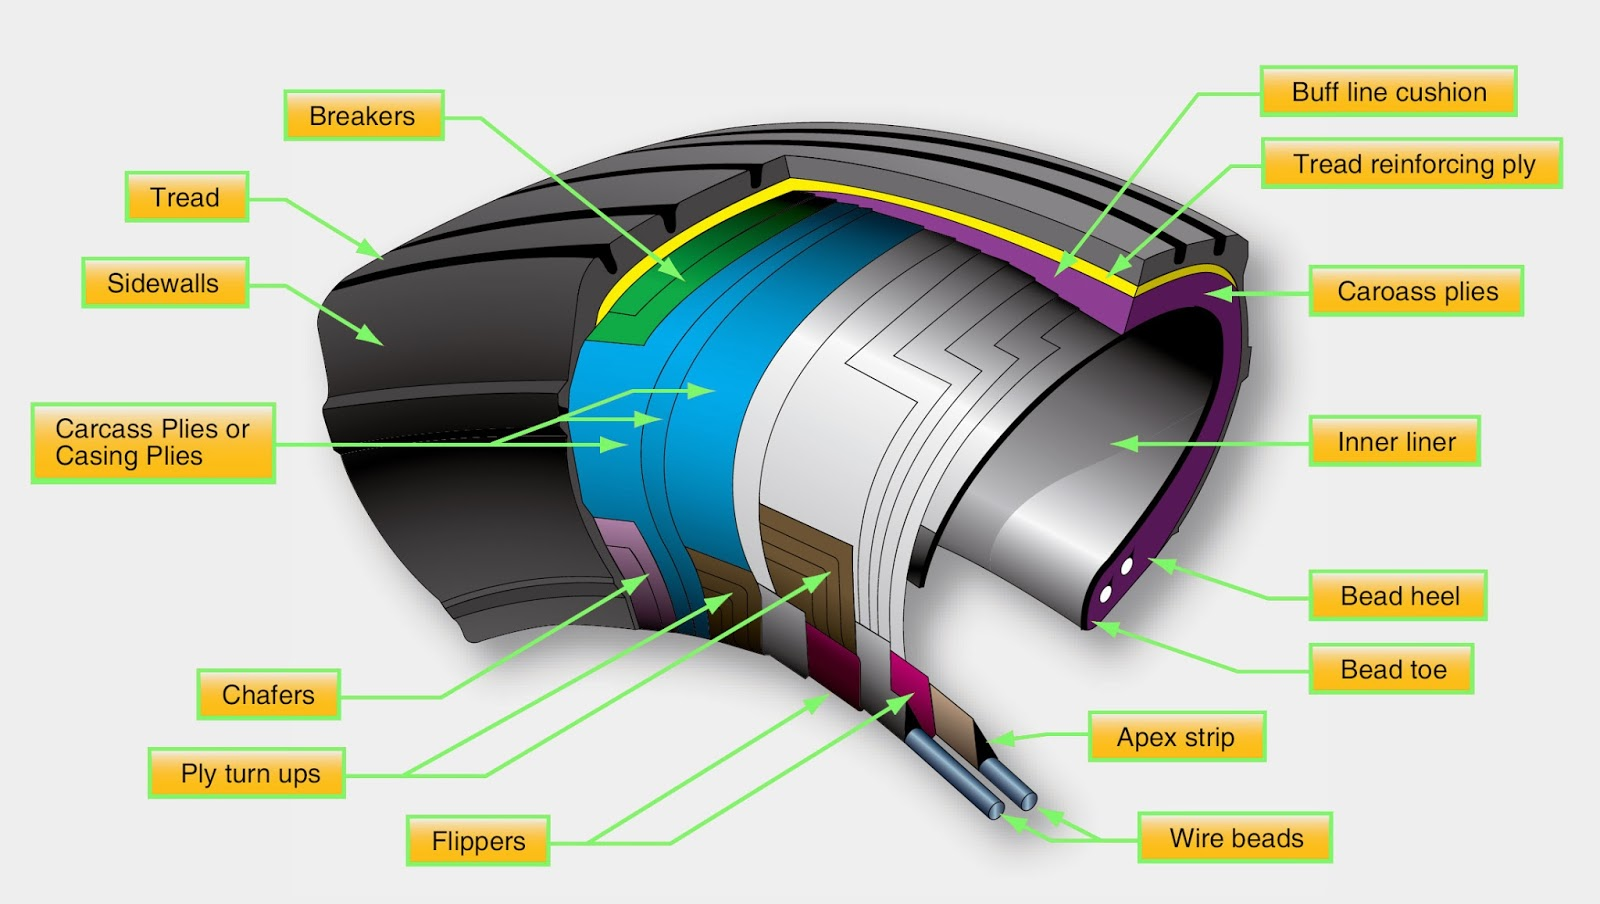 Aircraft Tires and Tubes | Aircraft Systems